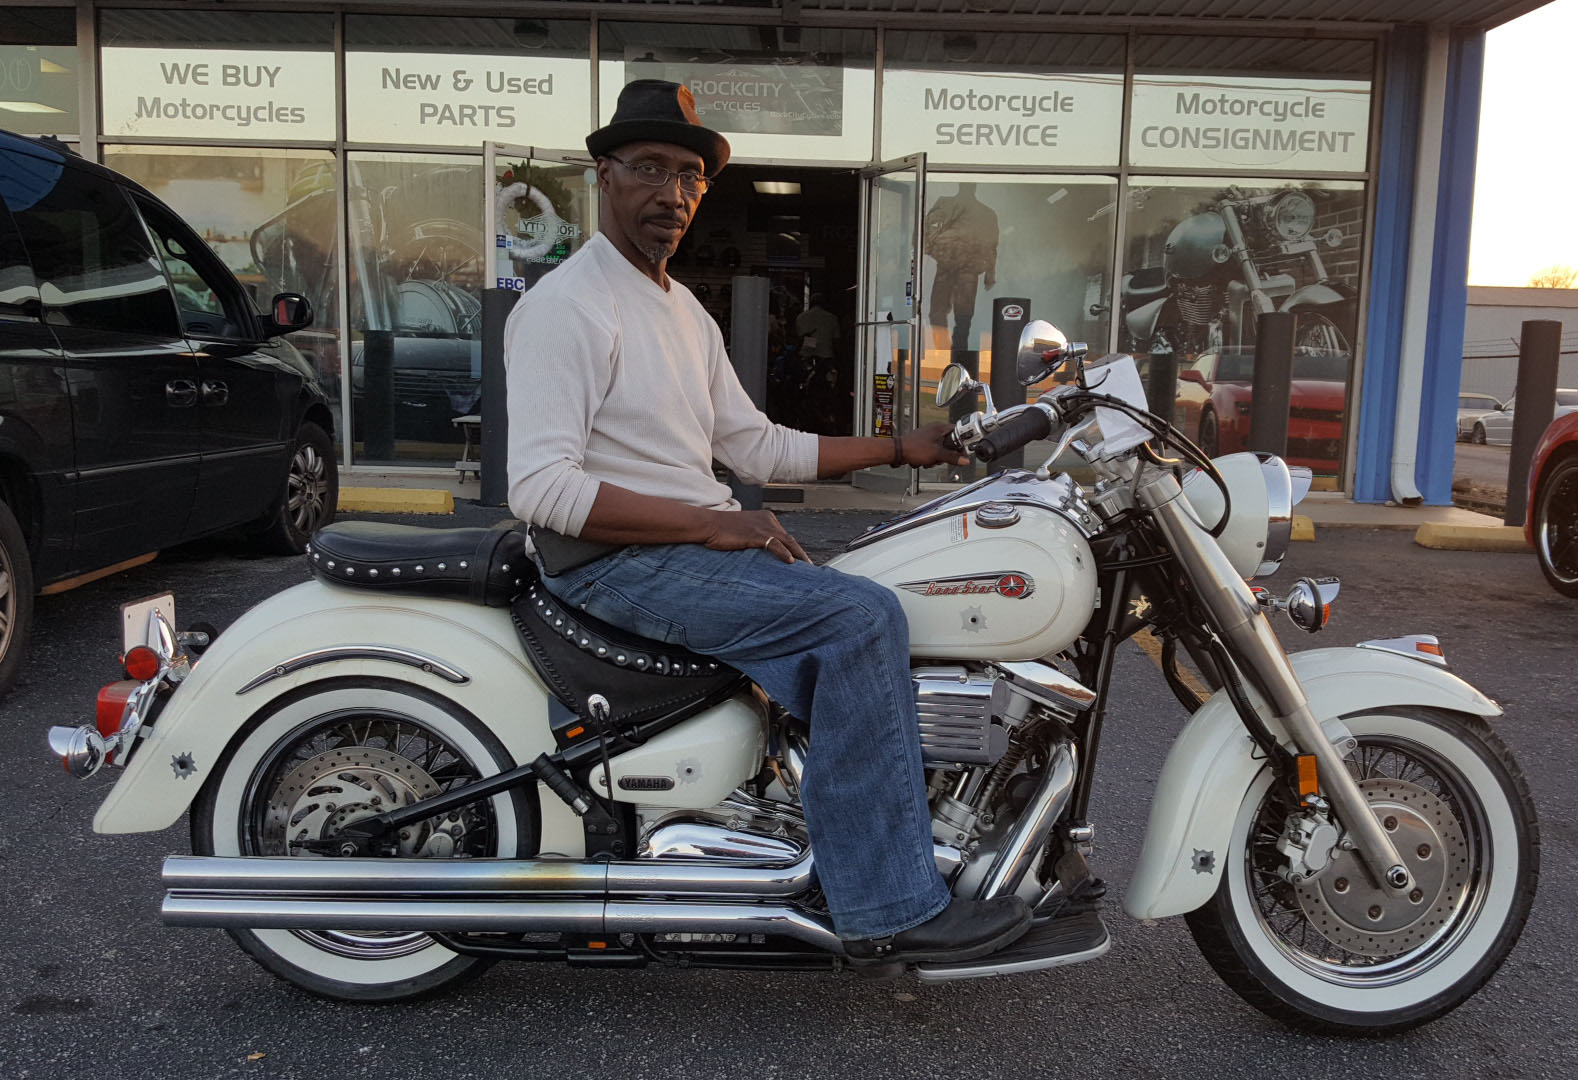 Sam W. with his 2000 Yamaha XV1600